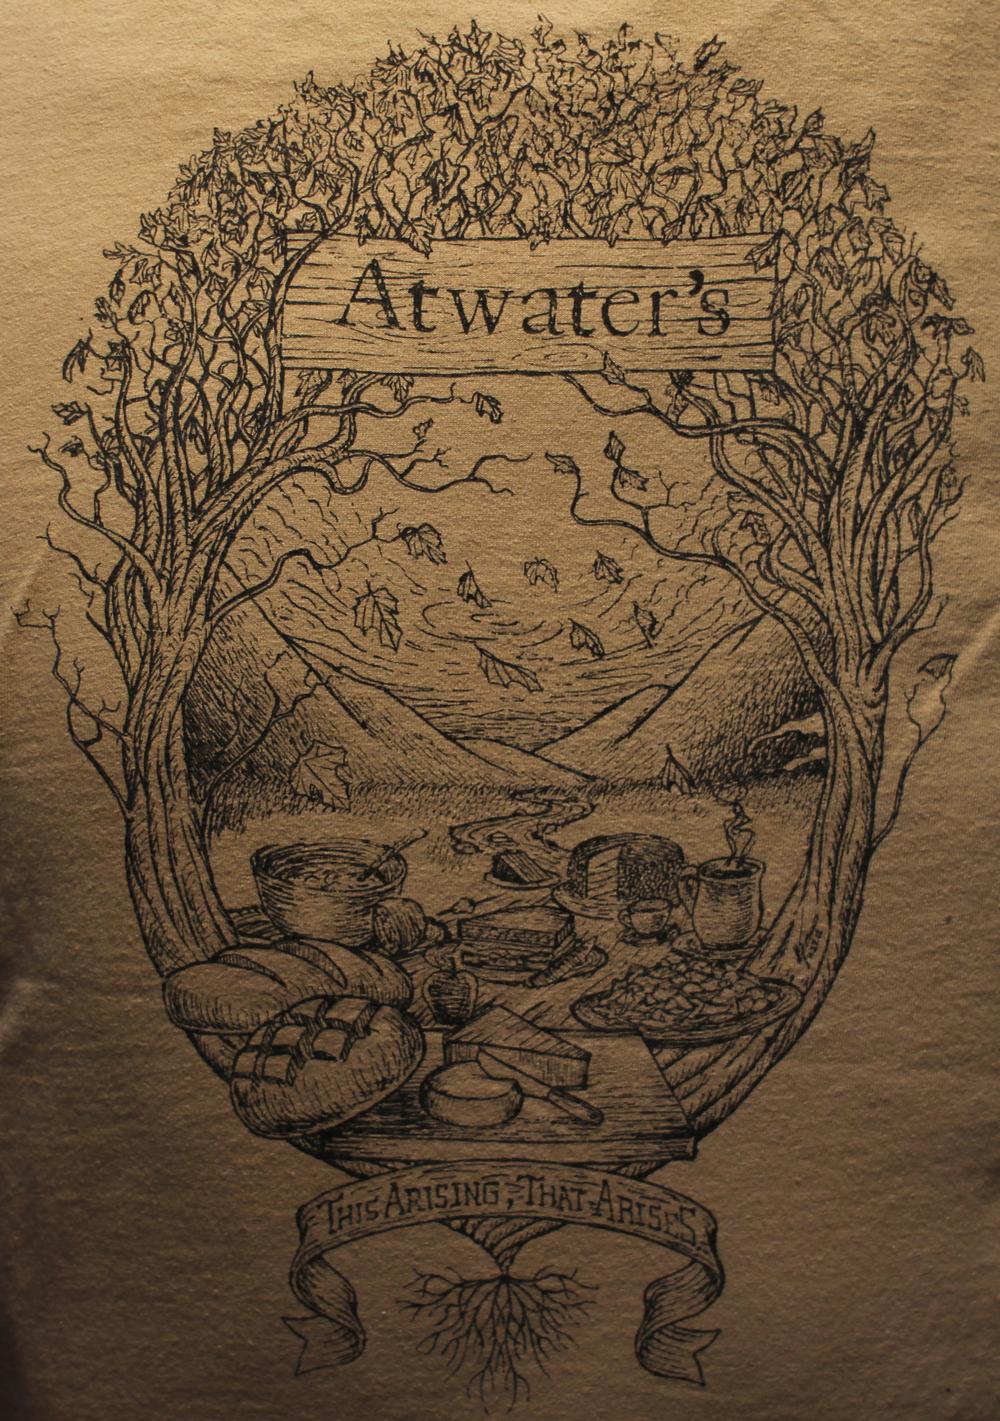 Atwater's . This Arising, That Arises.